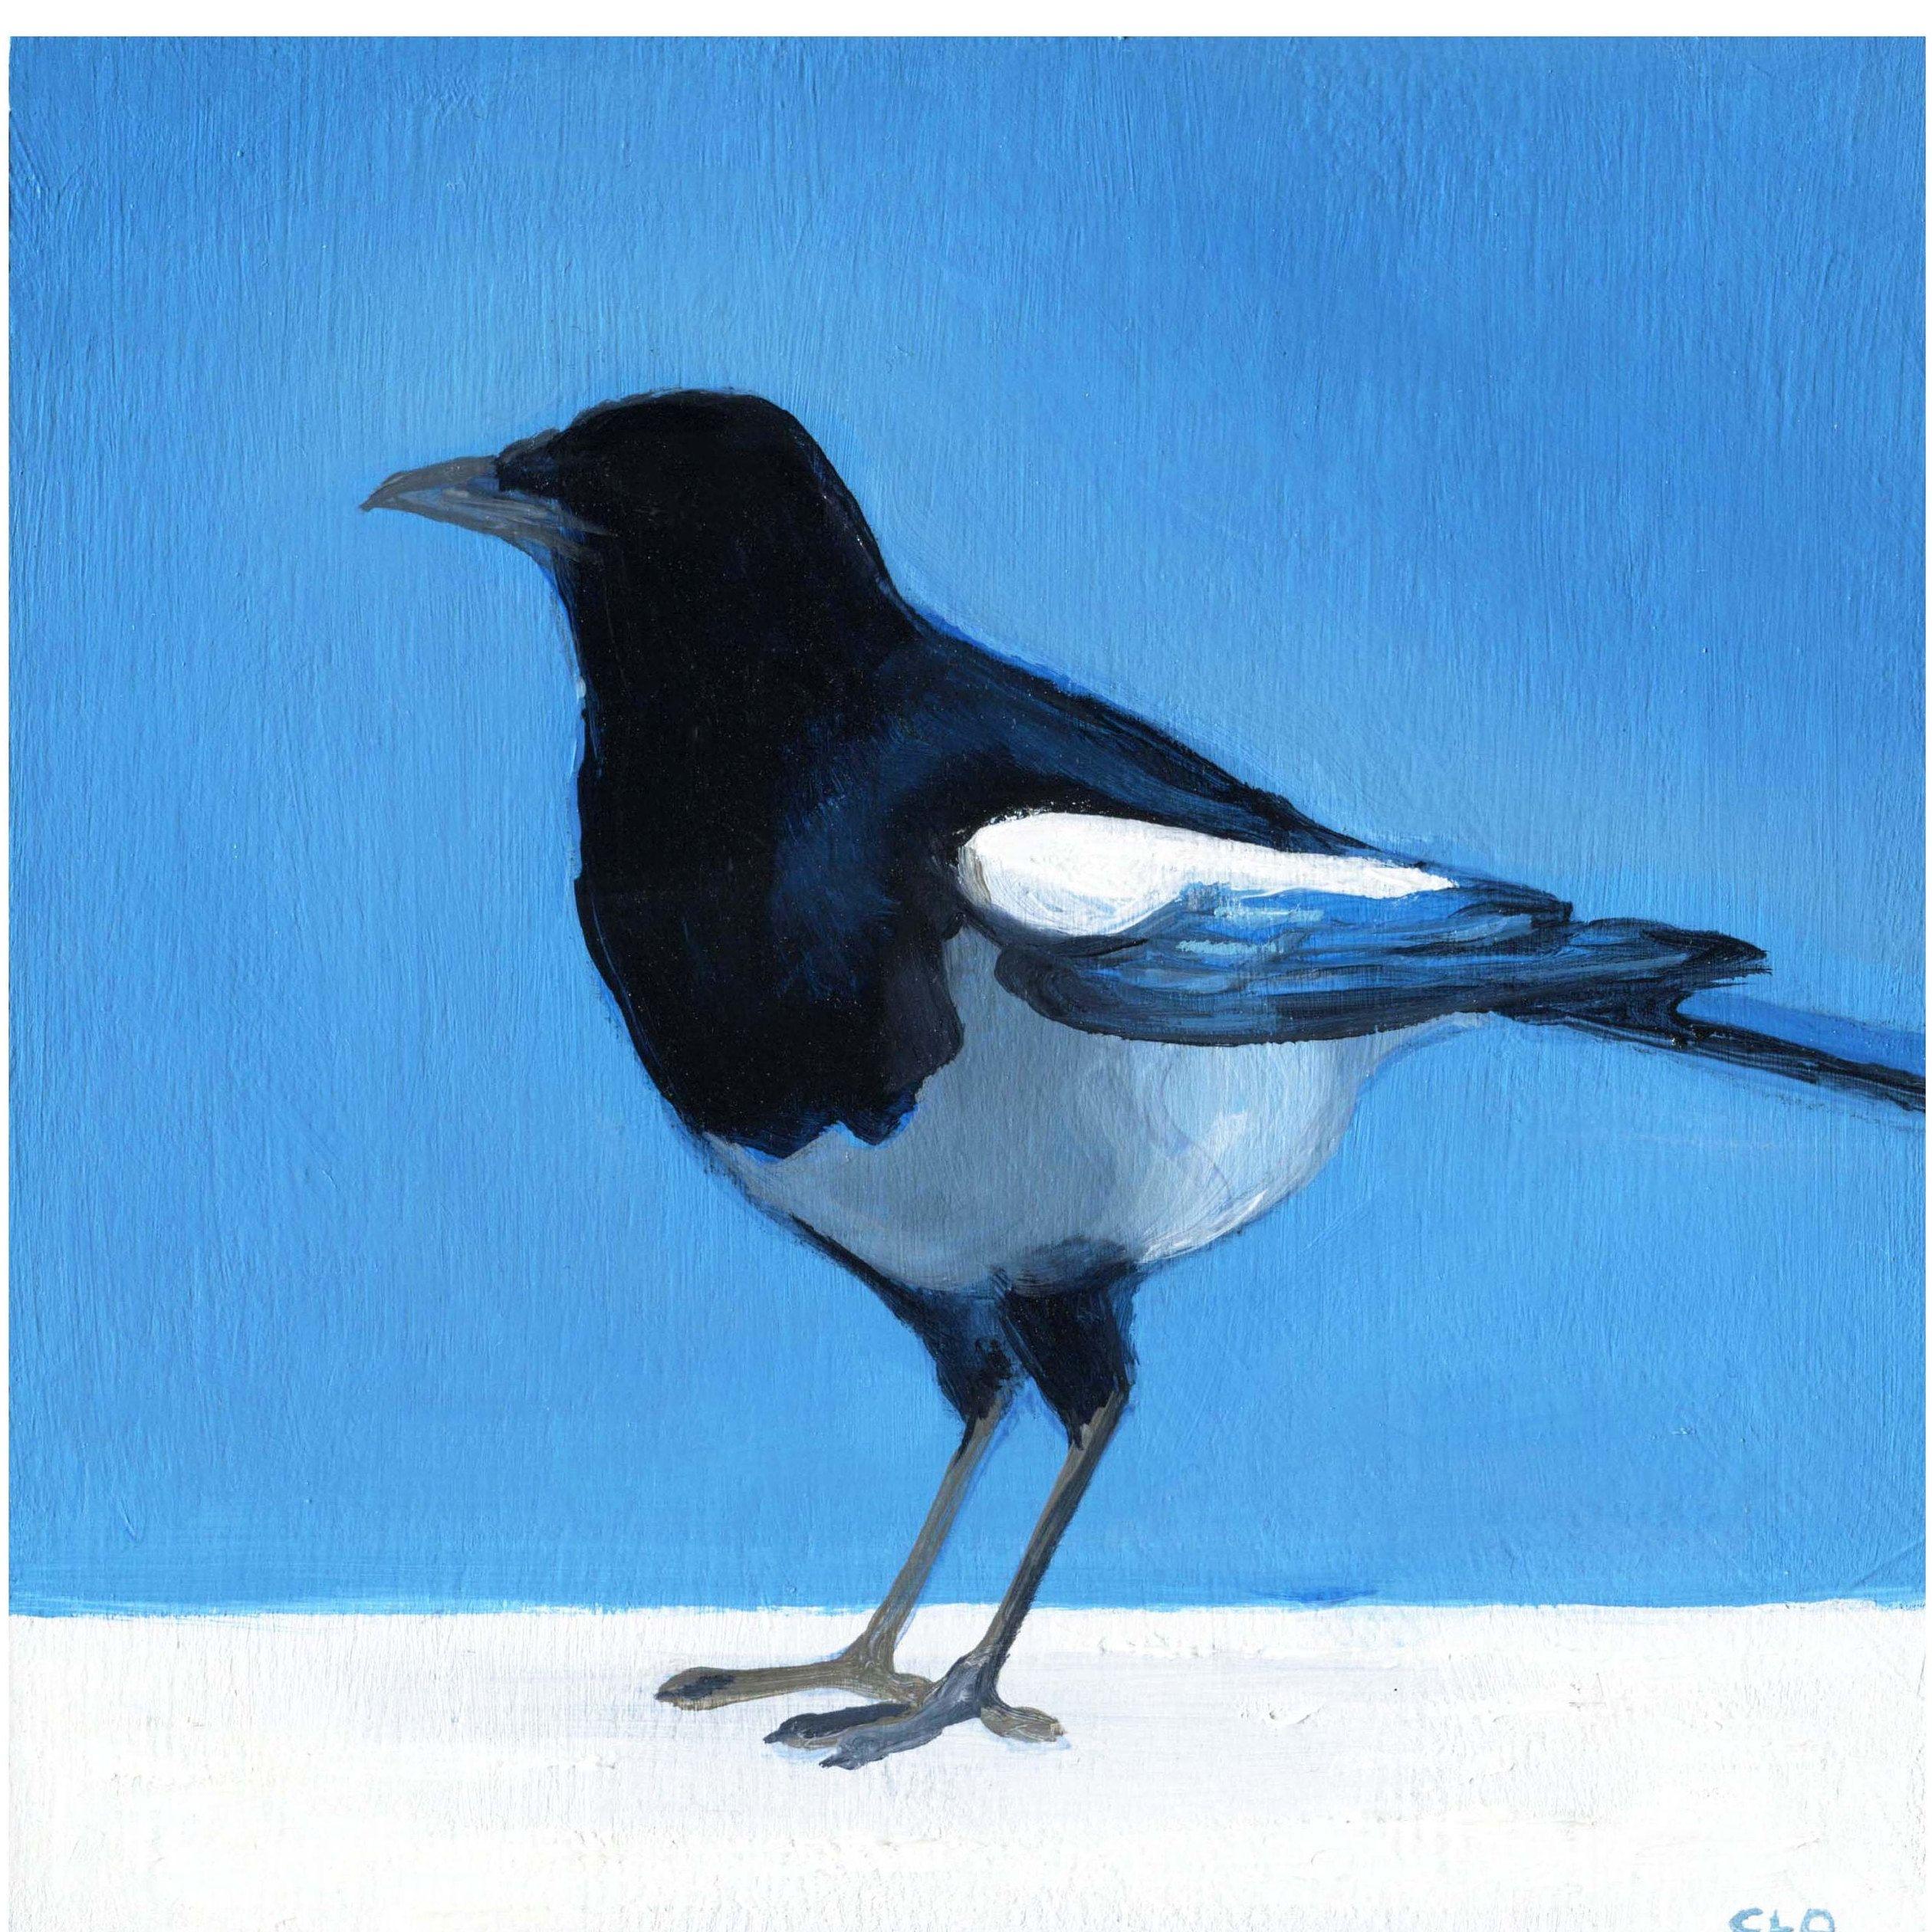 Magpie On Blue Art Print Bright Black White And Blue Bird Art Print Small Magpie Bird Painting Bird Decor Off Blue Art Prints Blue Bird Art Bird Art Print